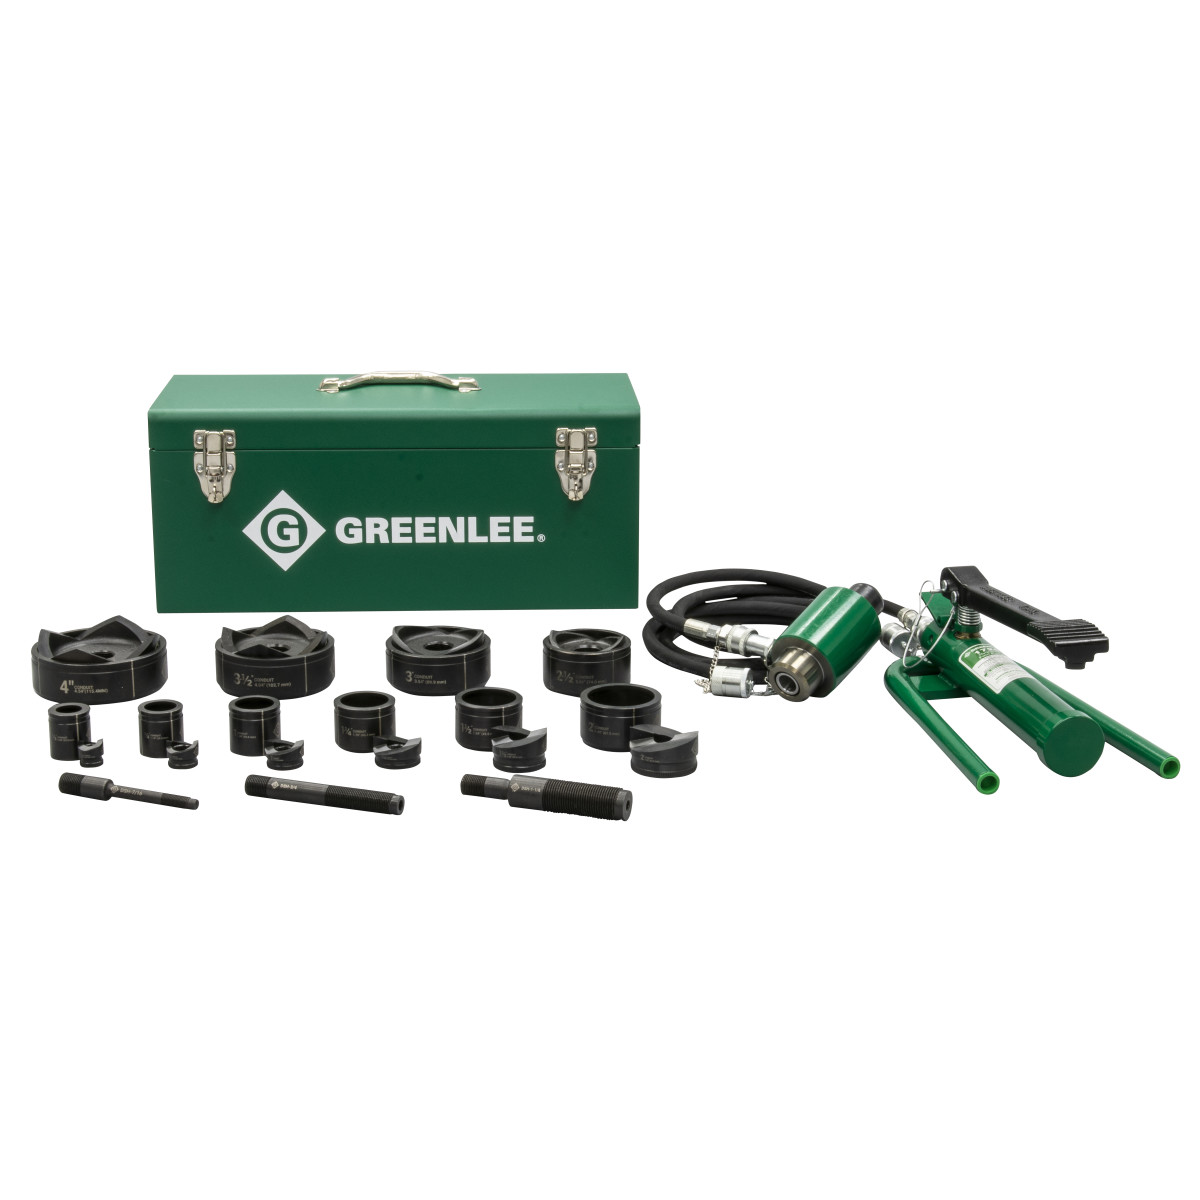 "Greenlee 7610SB Slug-Buster Hydraulc Driver Kit, for 1/2"" - 2"" Conduit"